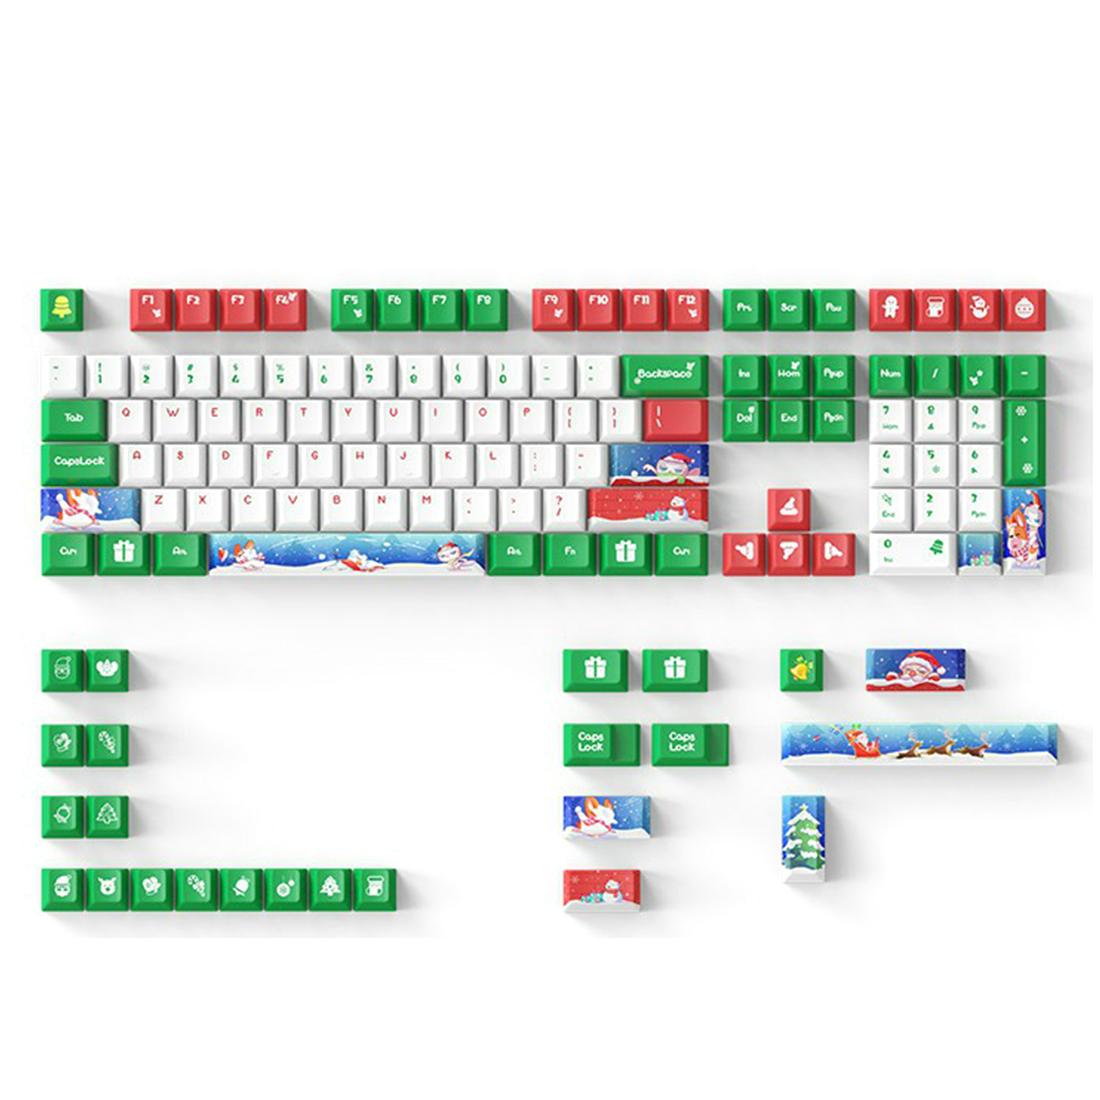 DAGK 132 keys Mechanical Keyboard Keycaps PBT Dye-Sub Mahjong Keycaps For 61 68 84 96 108 Mechanical Keyboard For Cherry6.25X